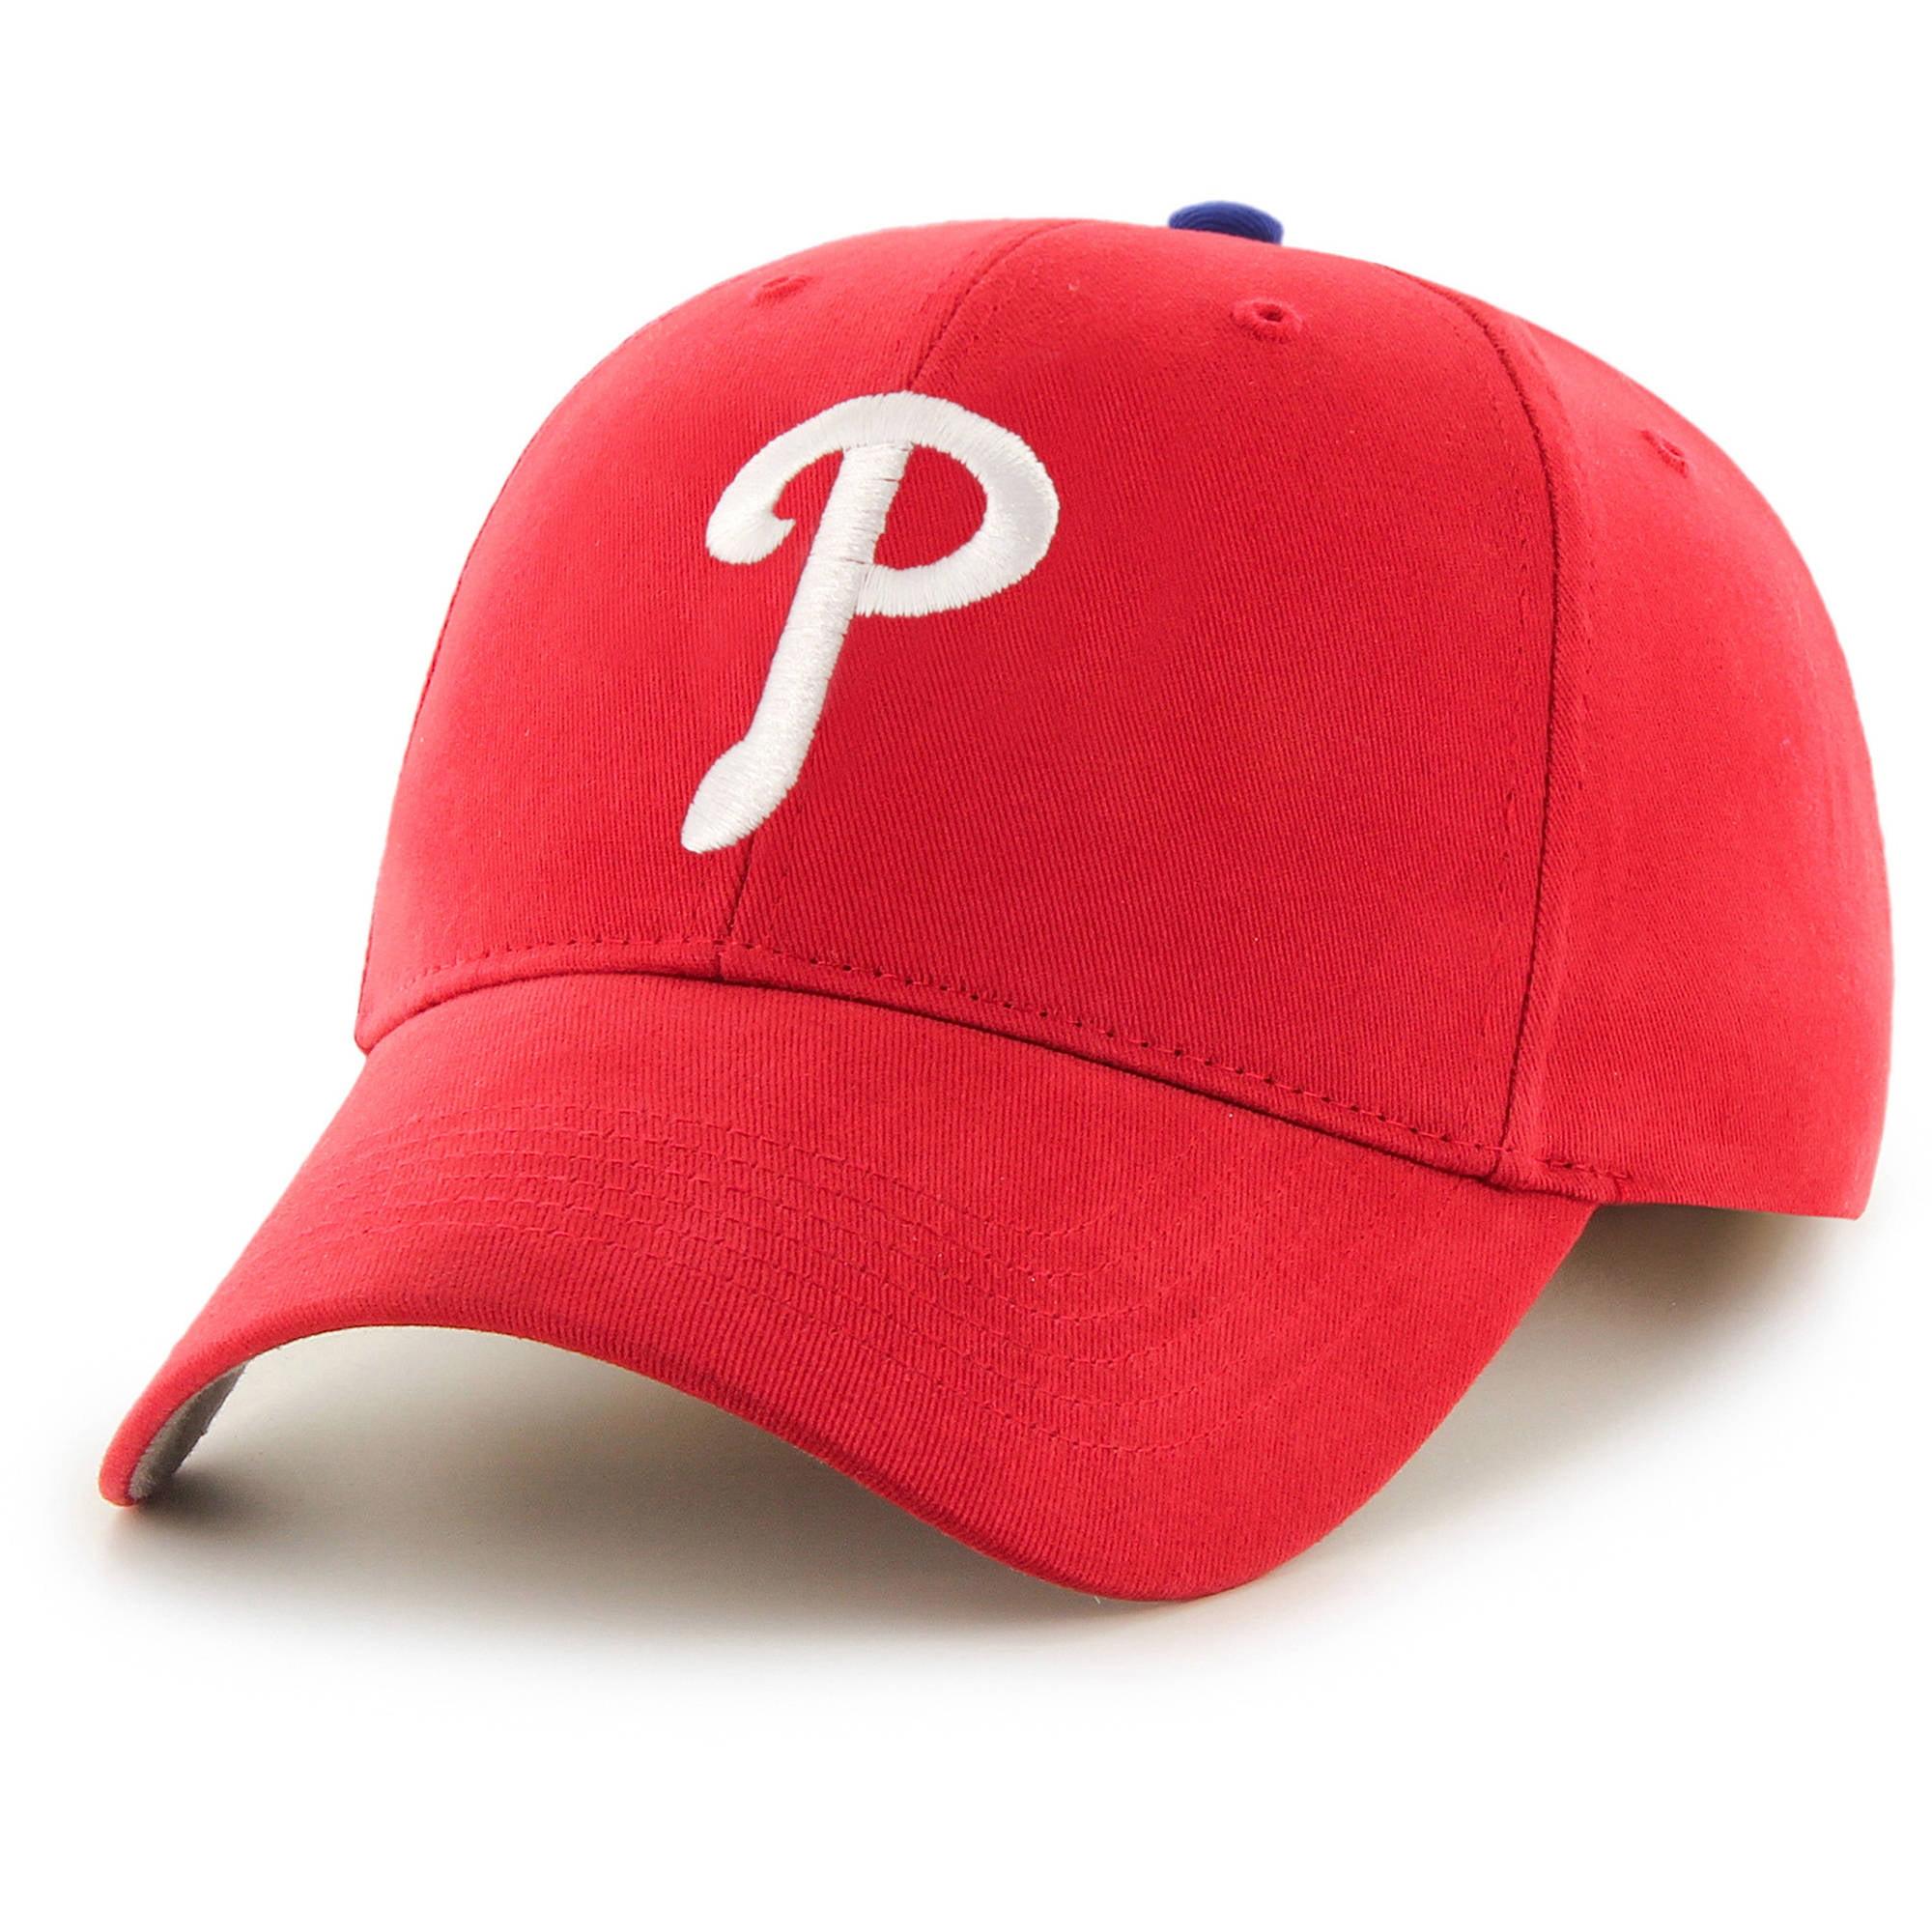 MLB Philadelphia Phillies Basic Cap / Hat by Fan Favorite